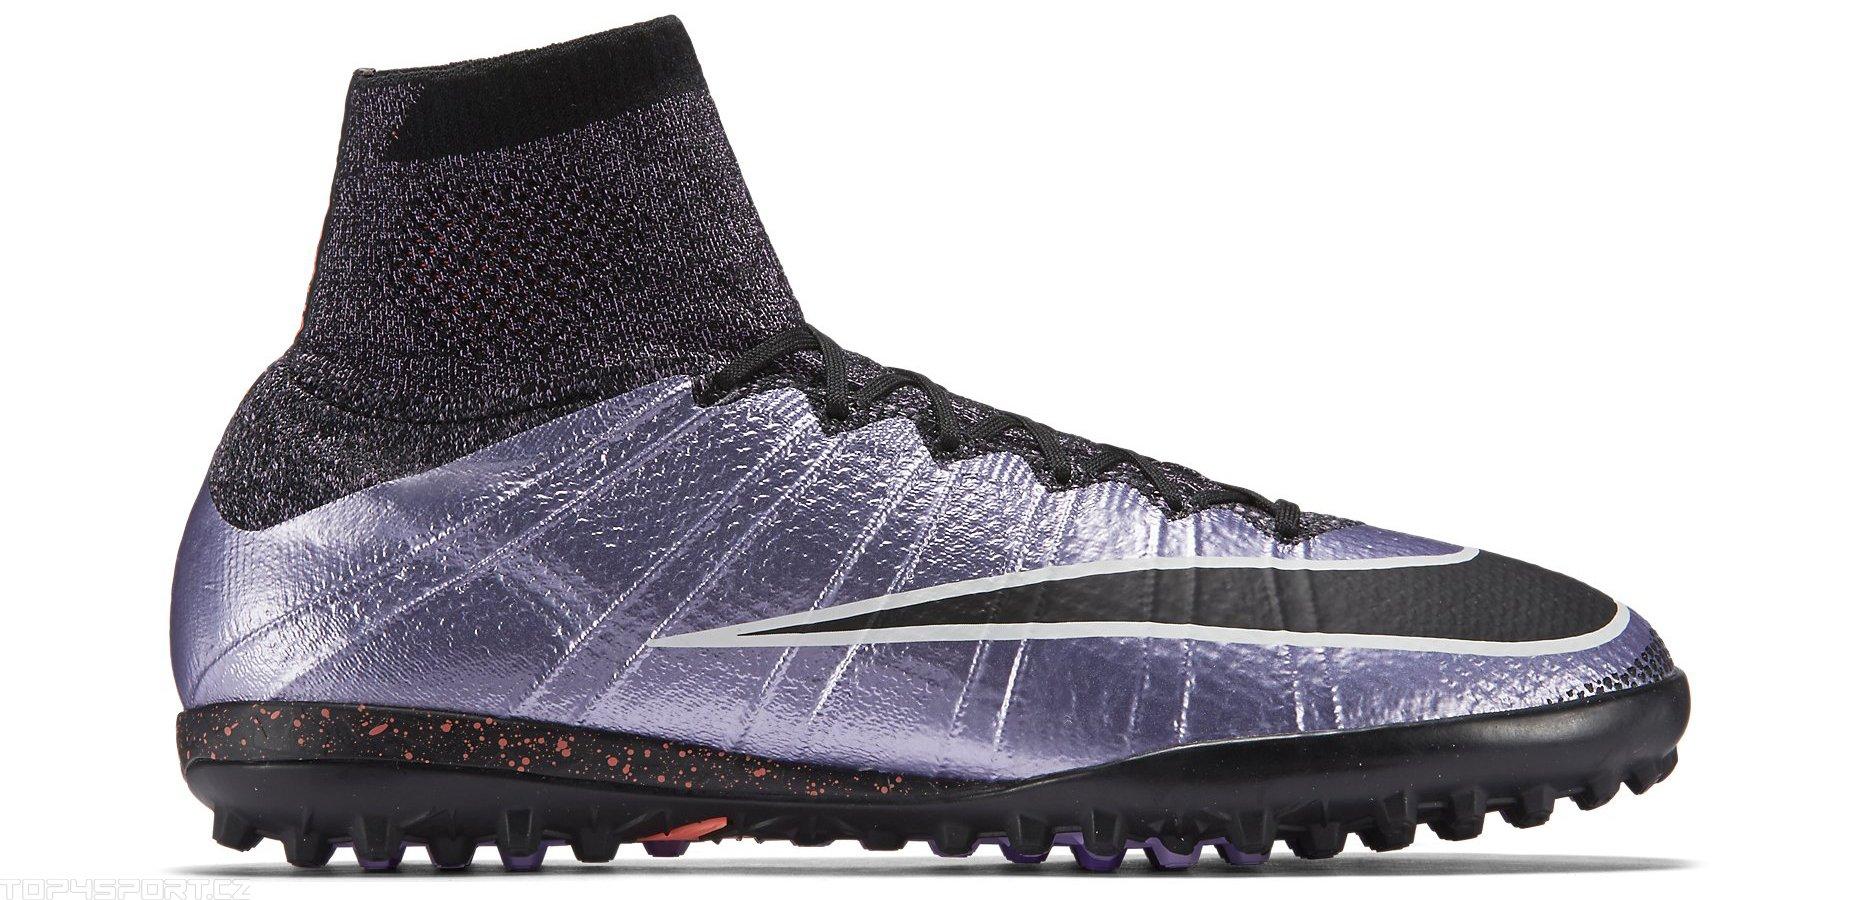 Kopačky Nike MERCURIALX PROXIMO TF